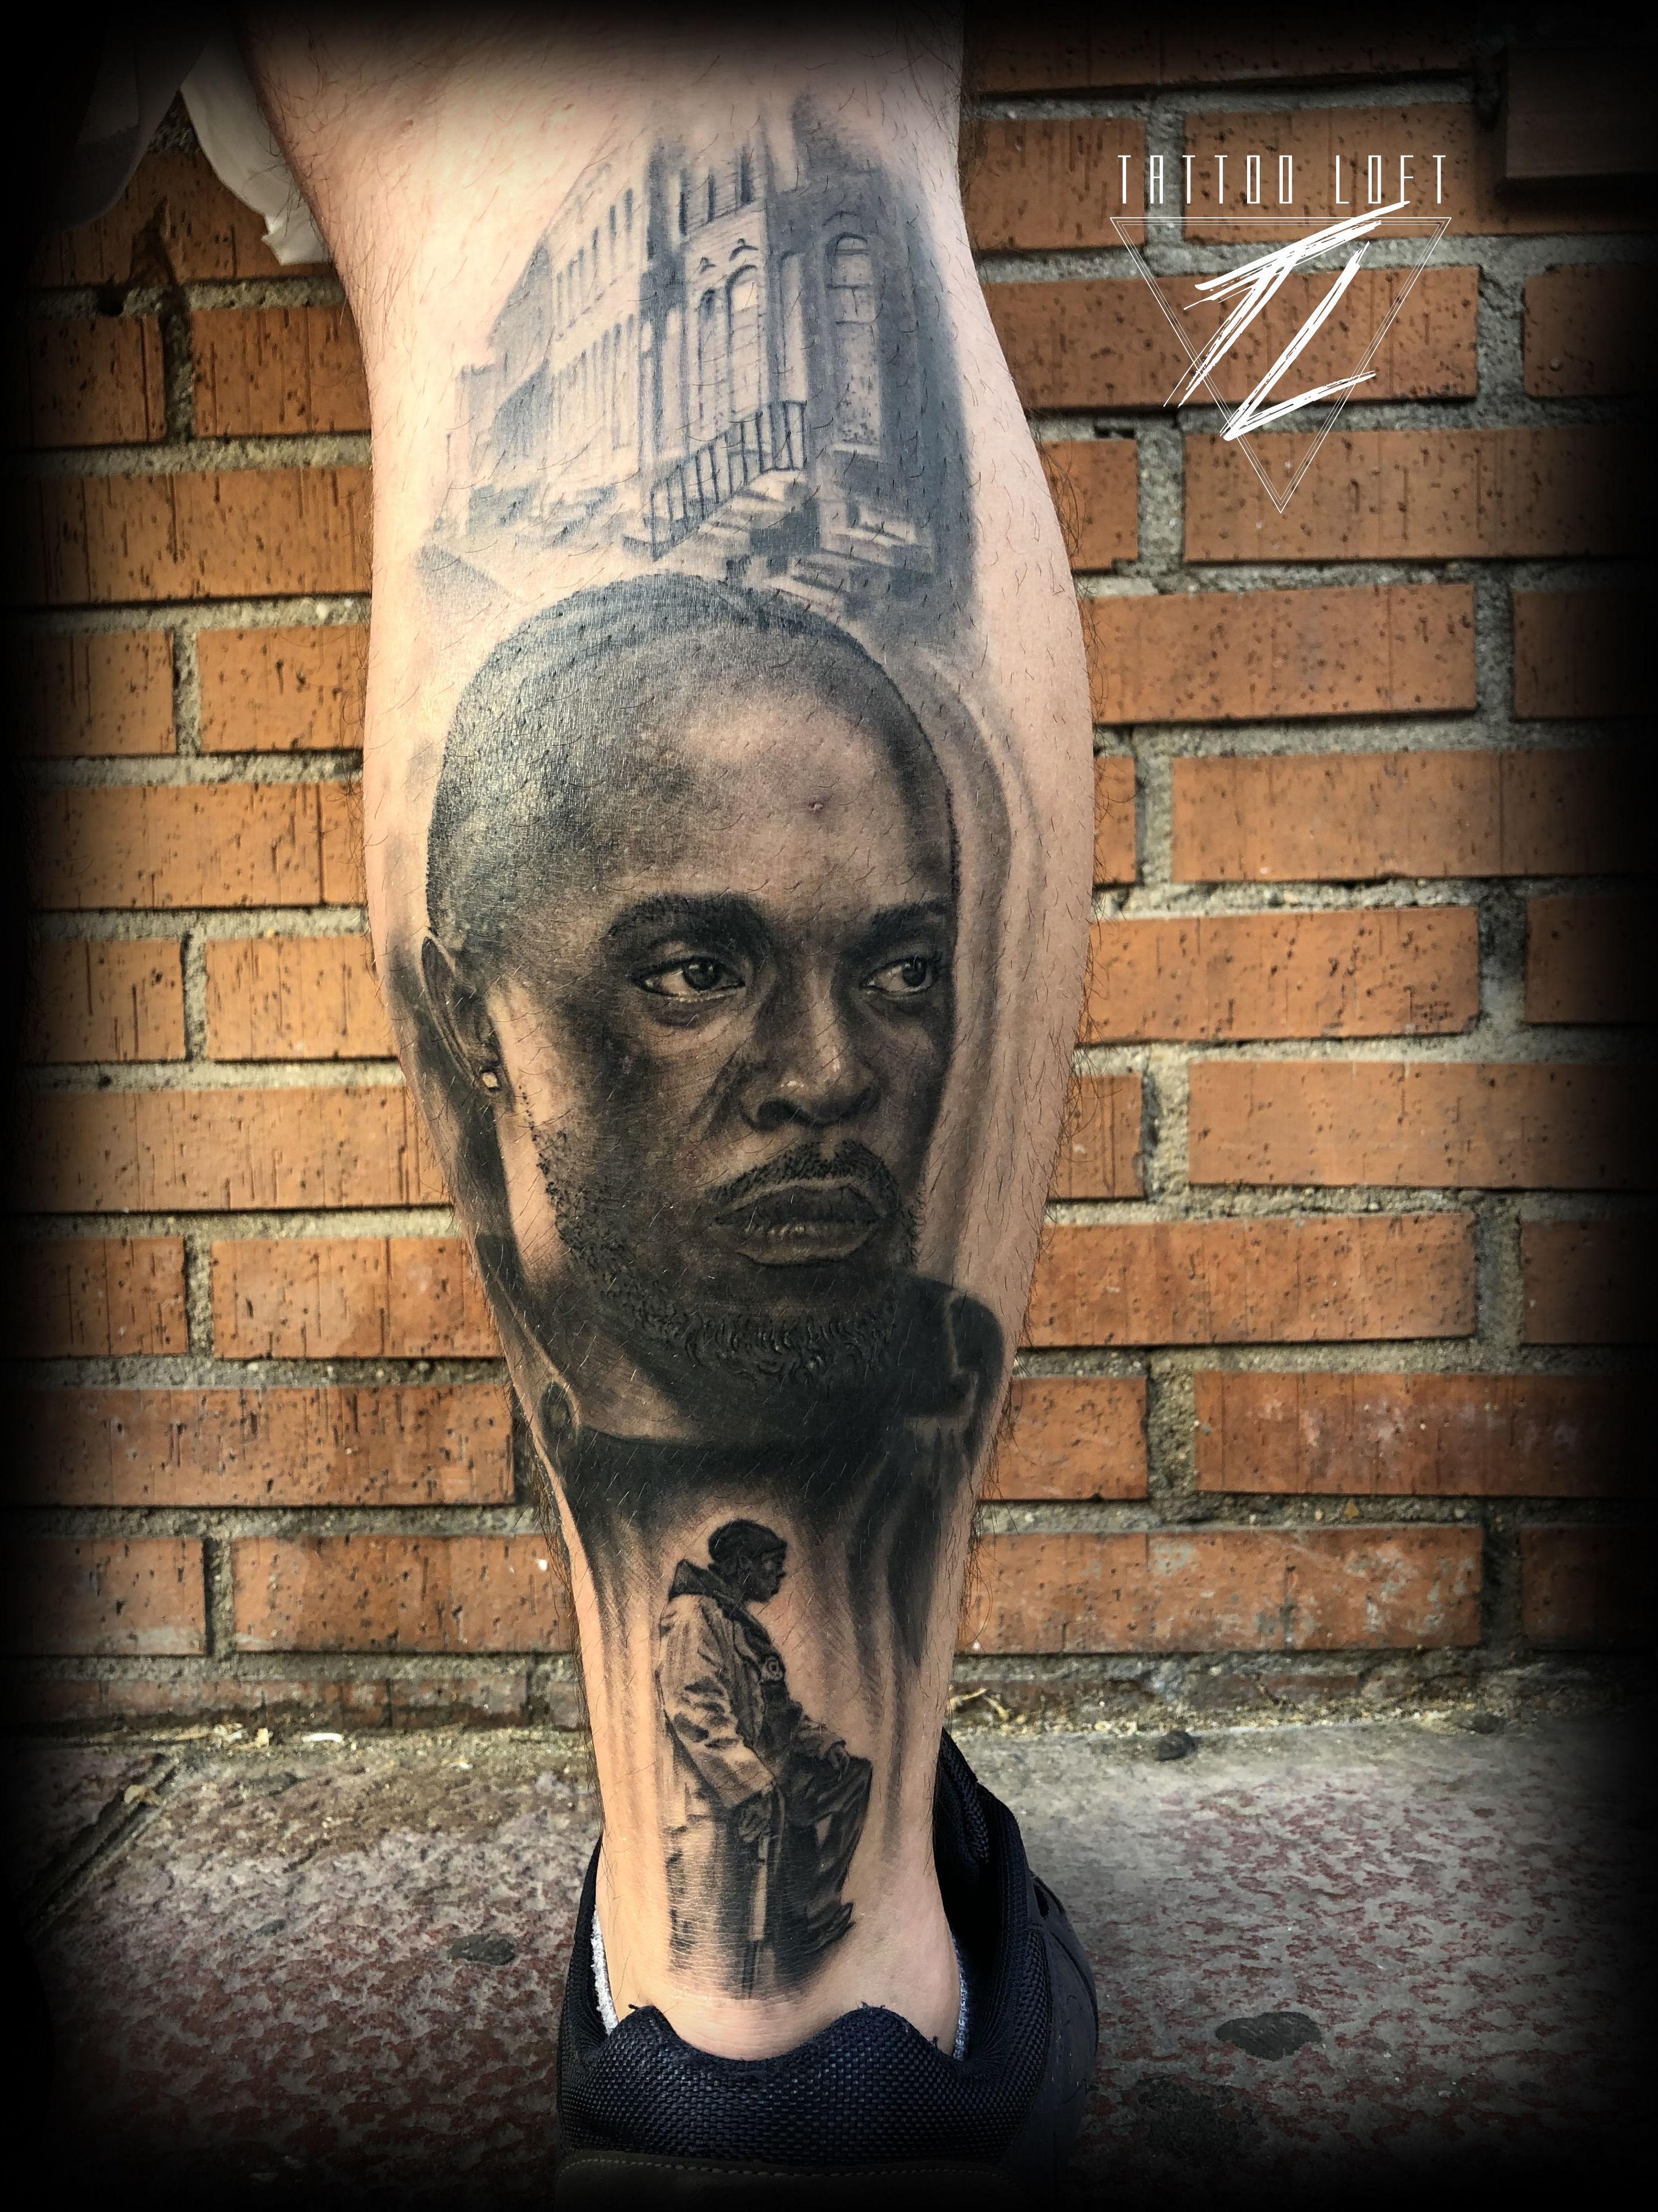 Tatuaje realismo Carabanchel